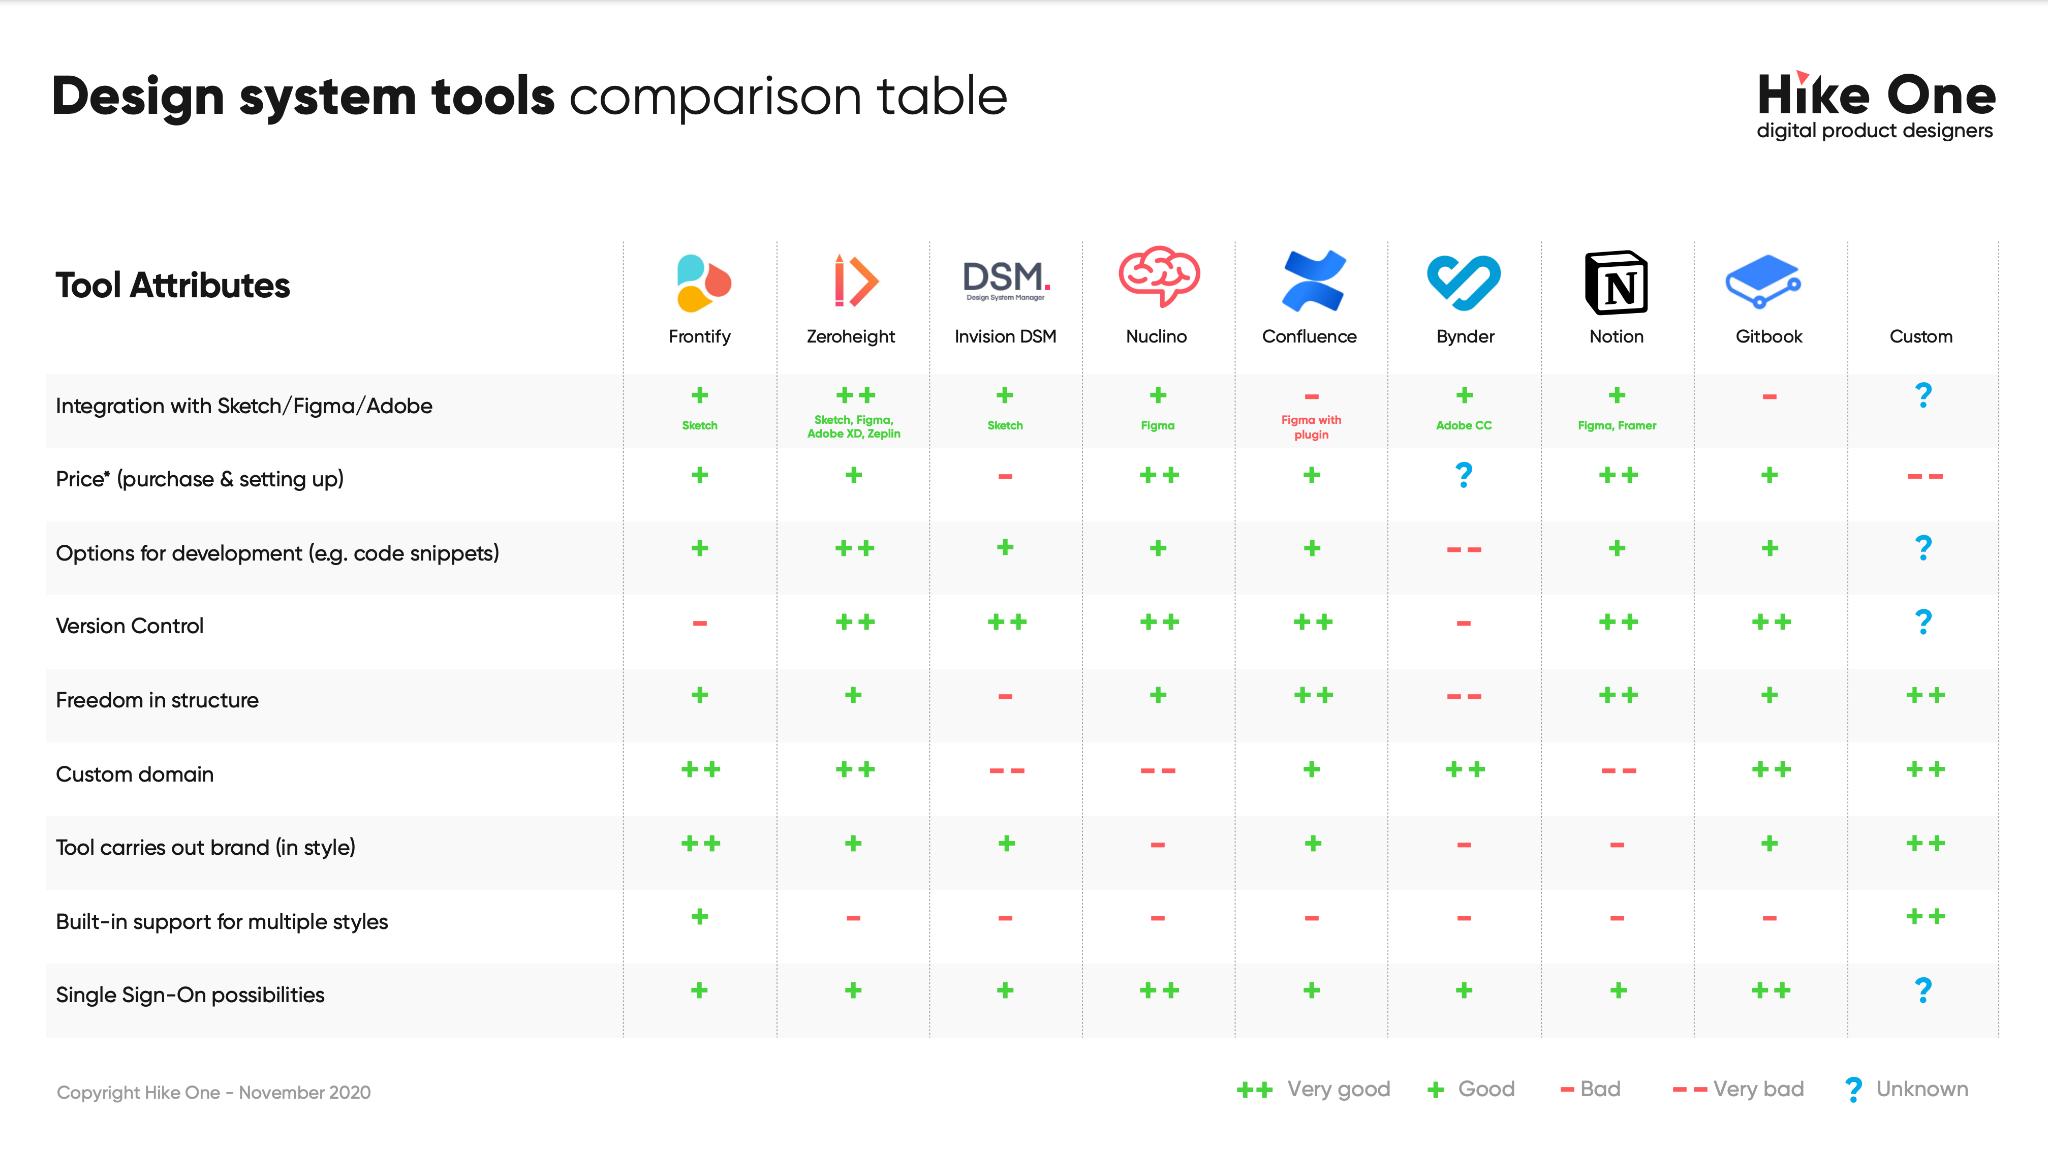 Design system tools